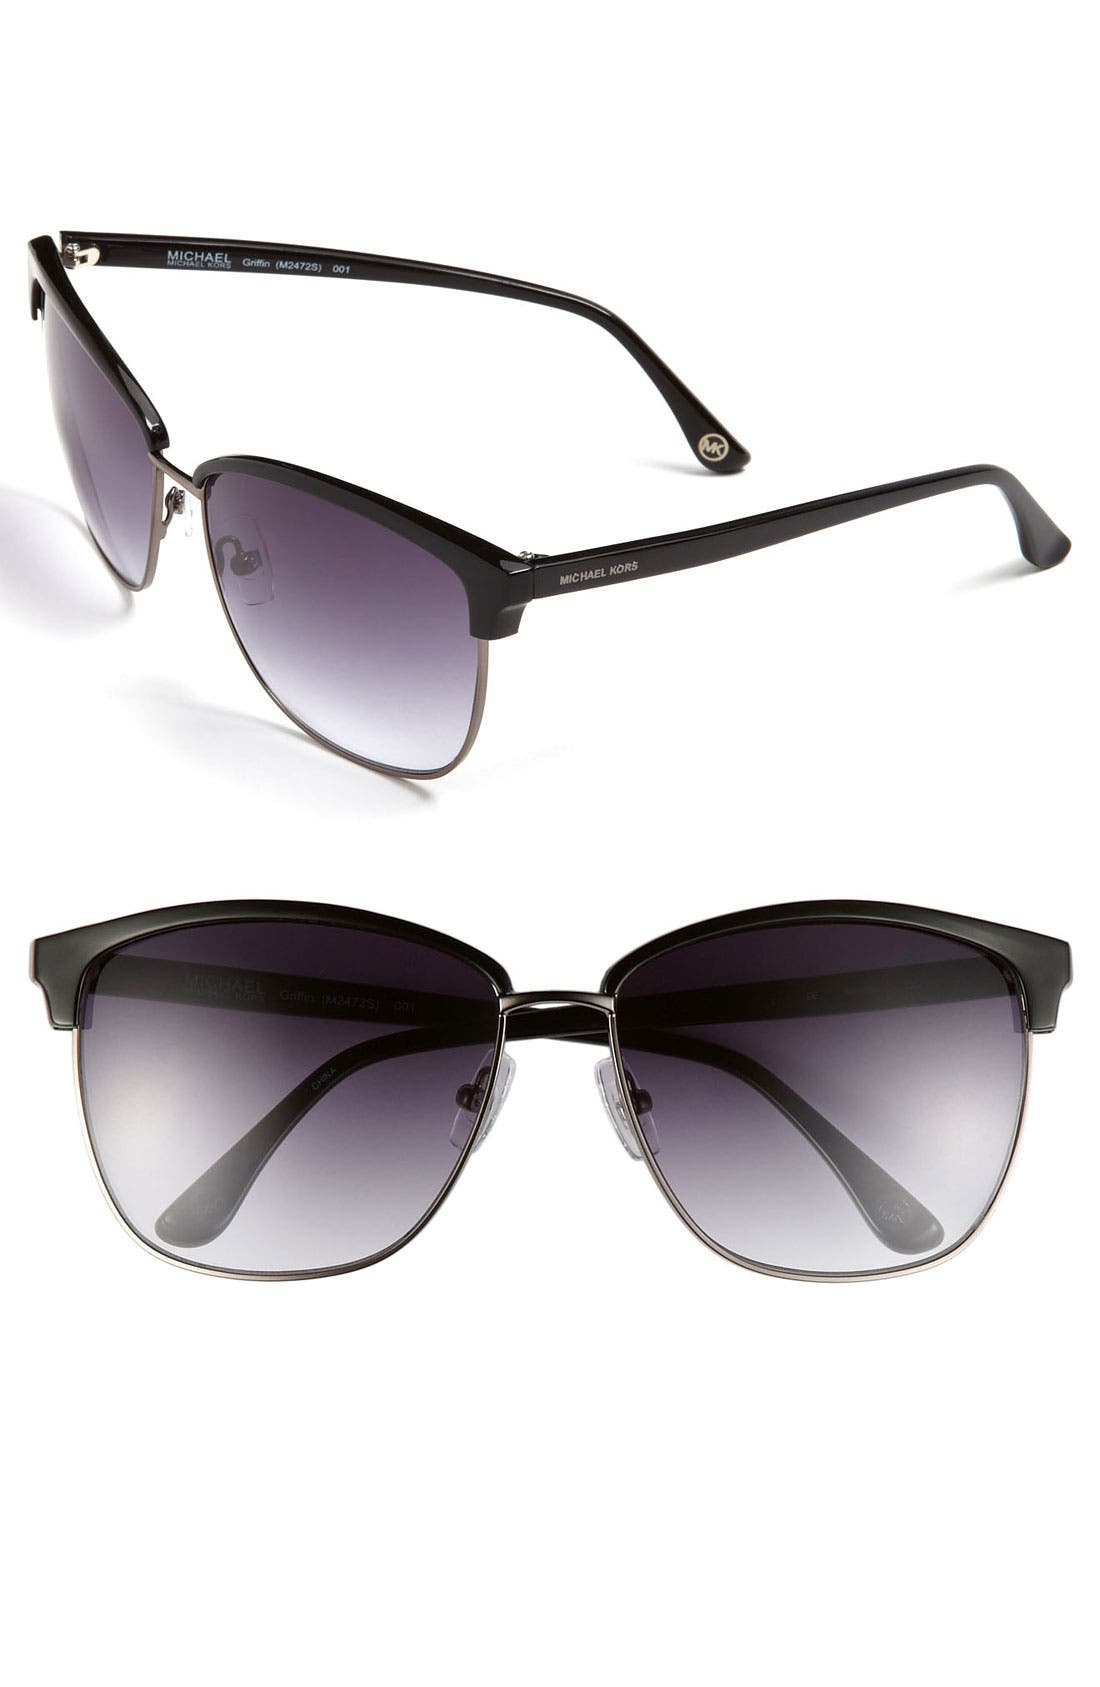 Main Image - MICHAEL Michael Kors 'Griffin' 60mm Retro Sunglasses